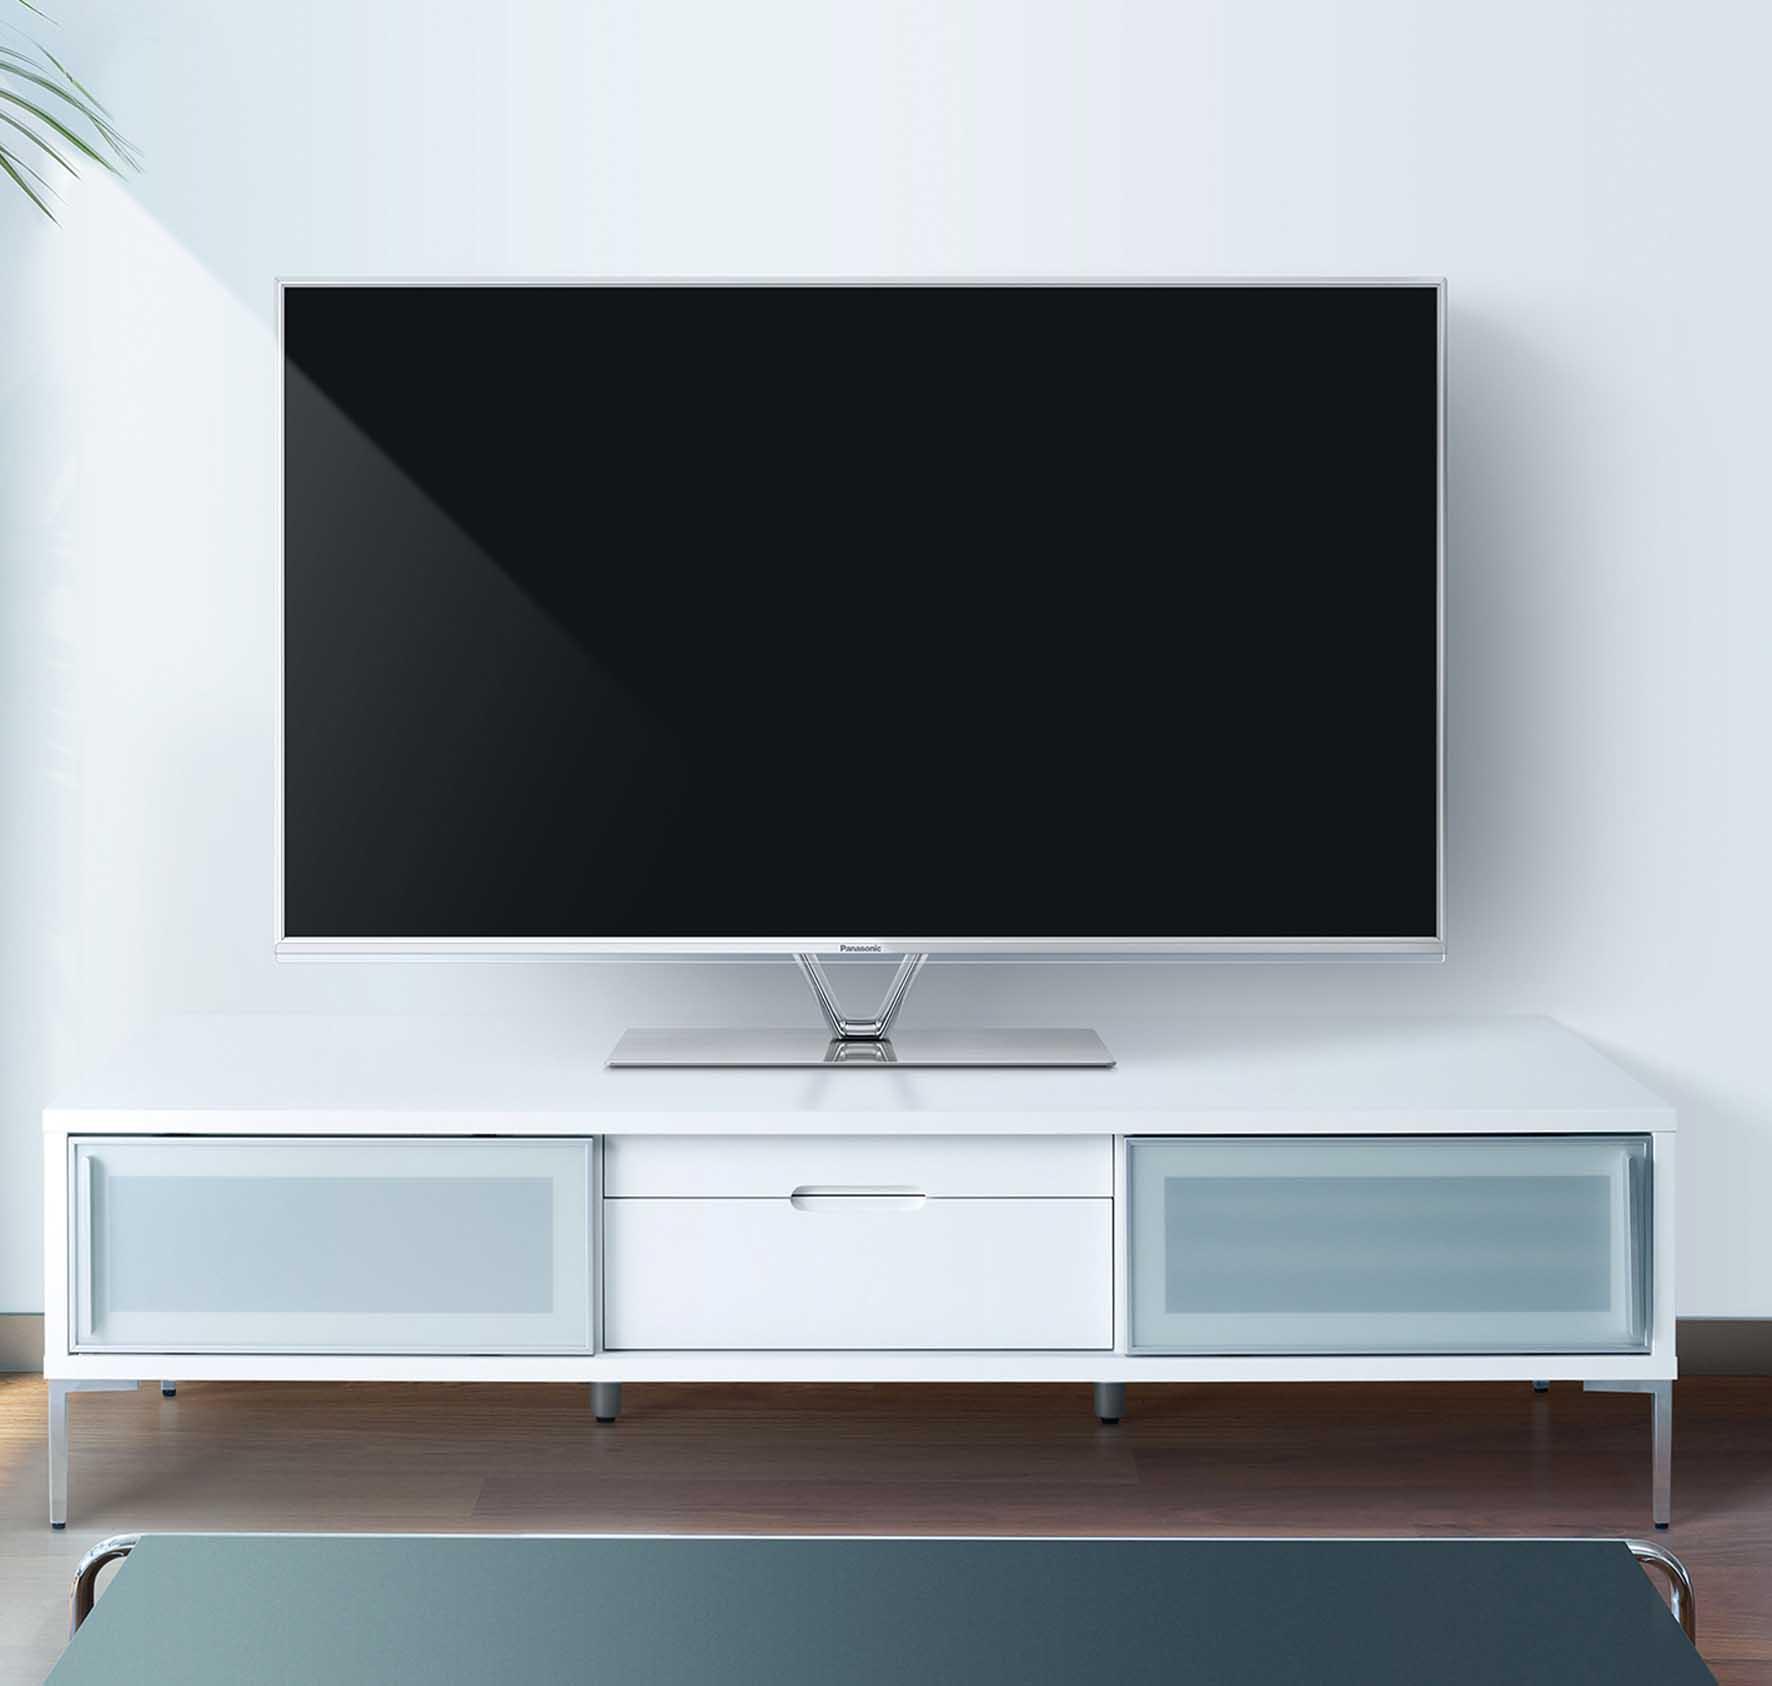 Panasonic tv lcd viera LIV01 b1 p L50DT60jpg 1